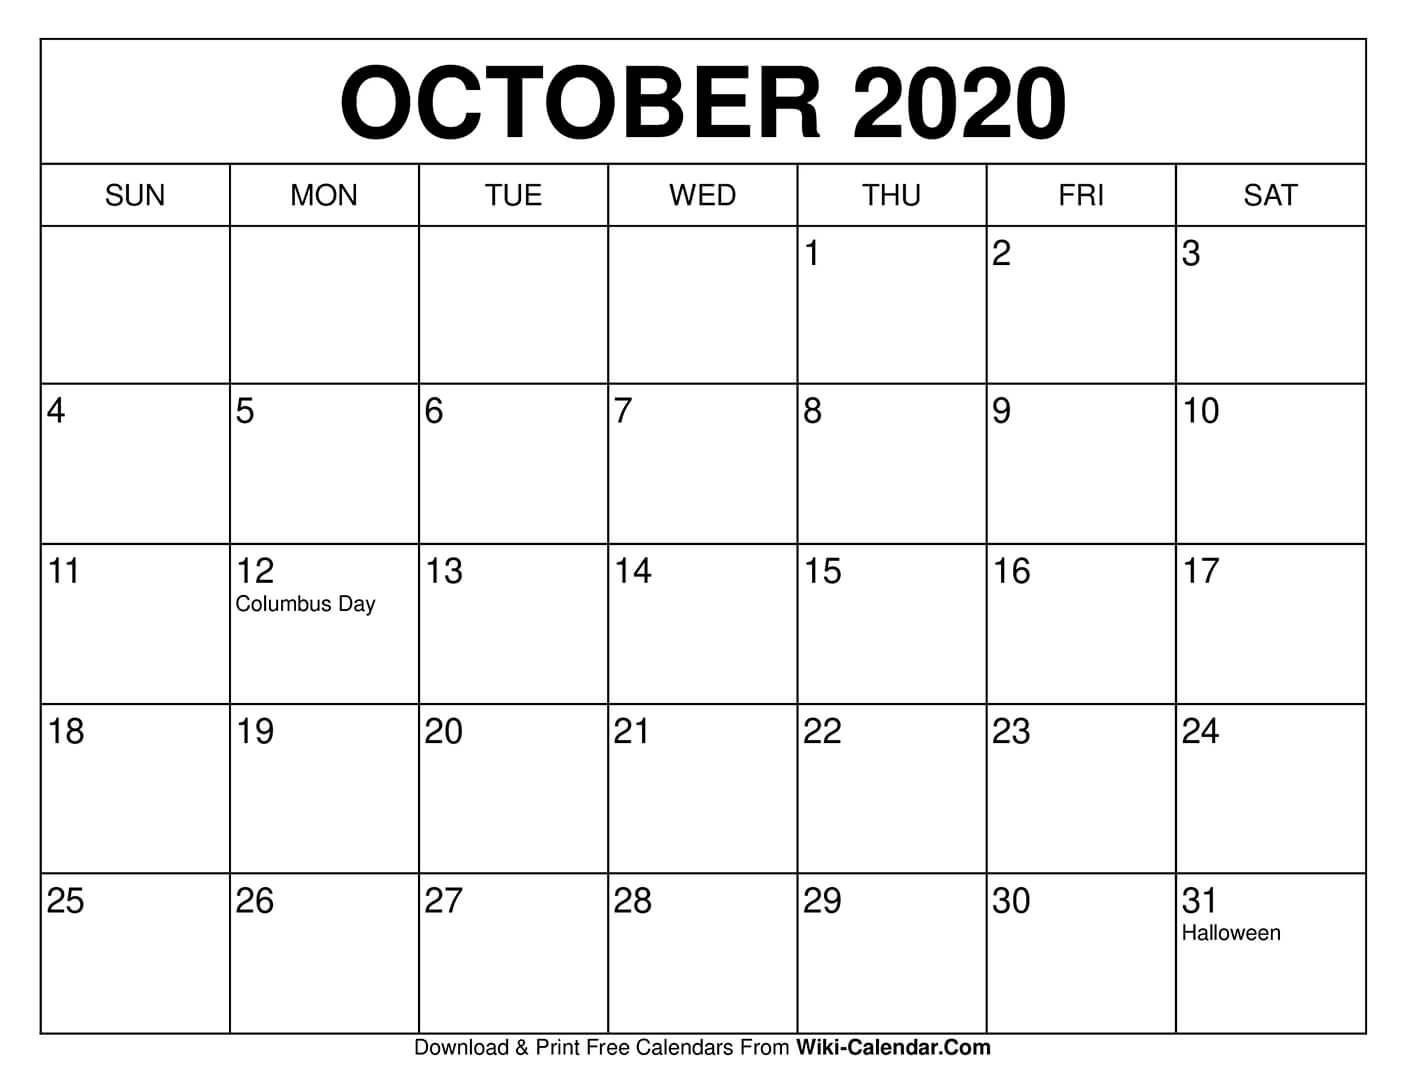 Free Printable October 2020 Calendars in 8.5 X 11 Free Printable Monthly Calendar 2020